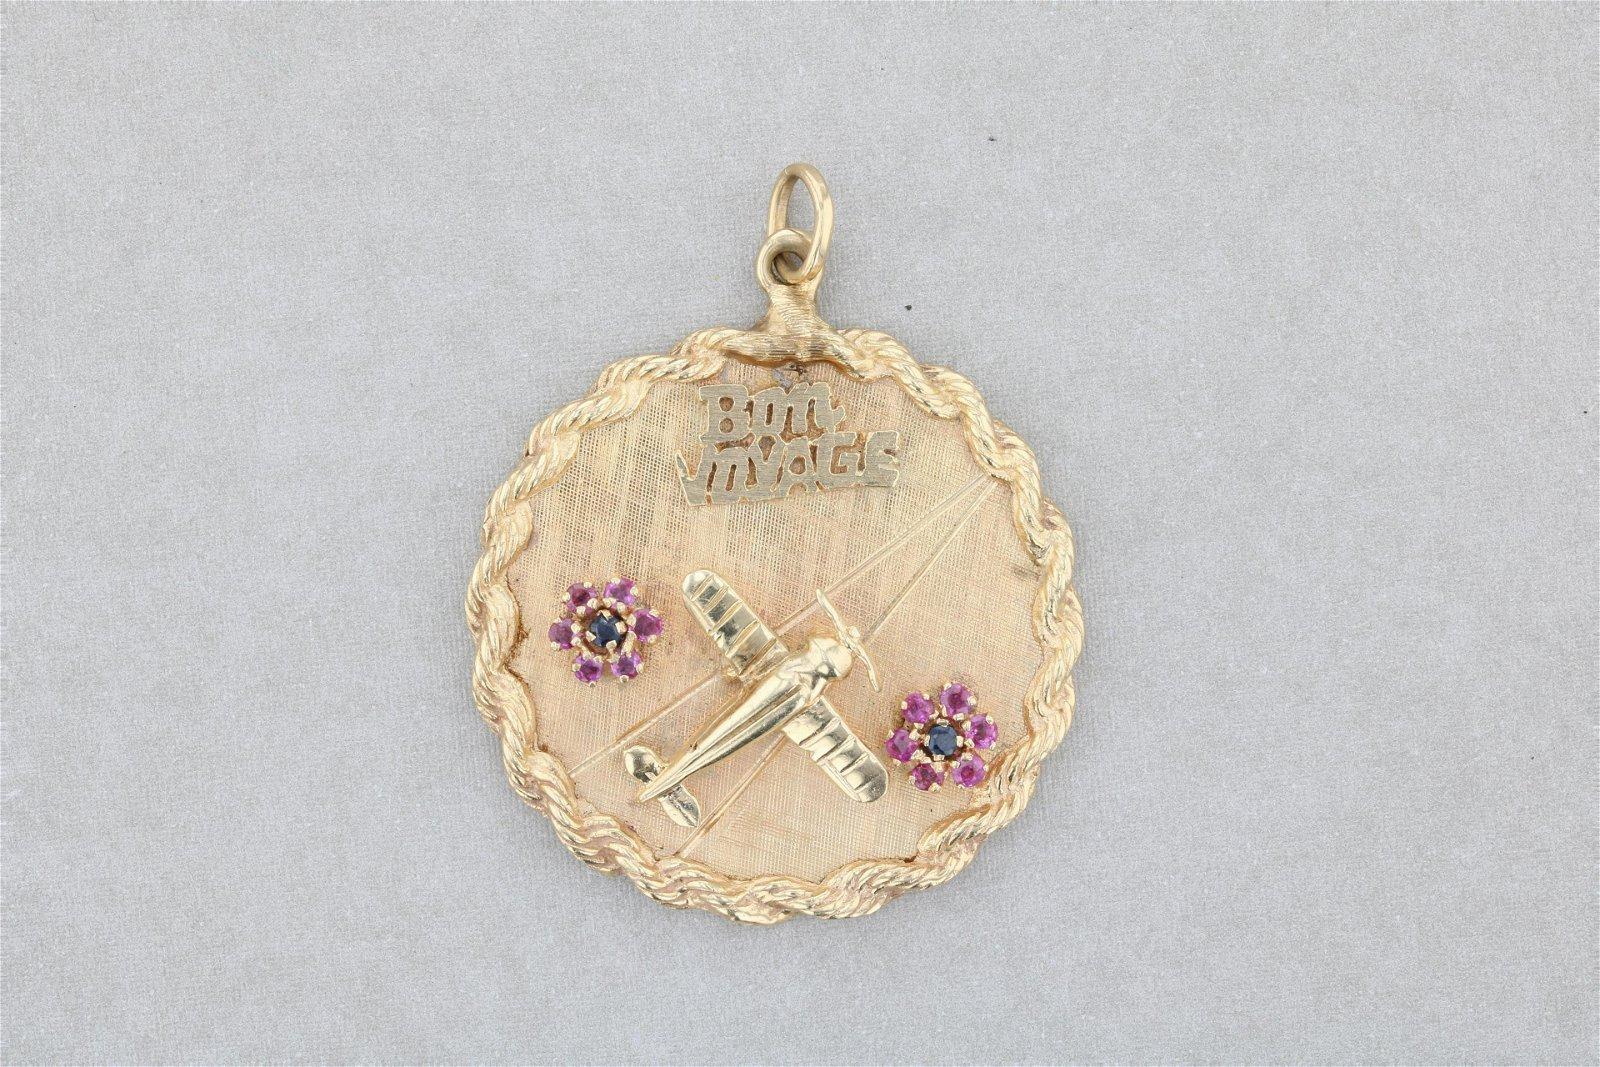 14K Custom Made Bon Voyage Round Medal